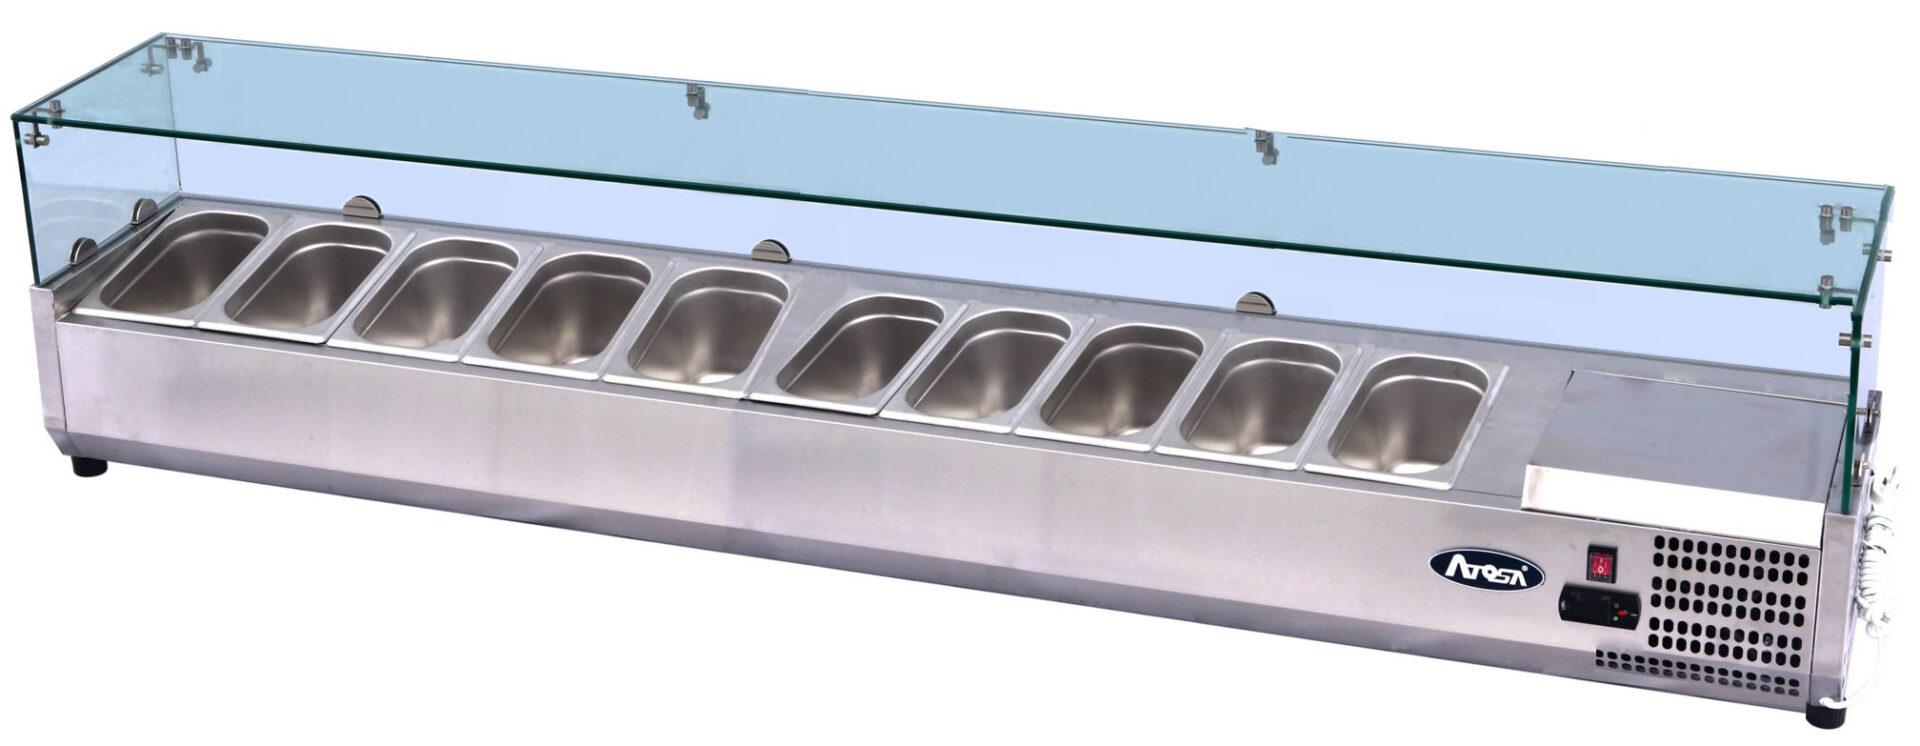 Atosa ESL3889 ESL Counter Top Salad Bar | BAC GN1/4 x10